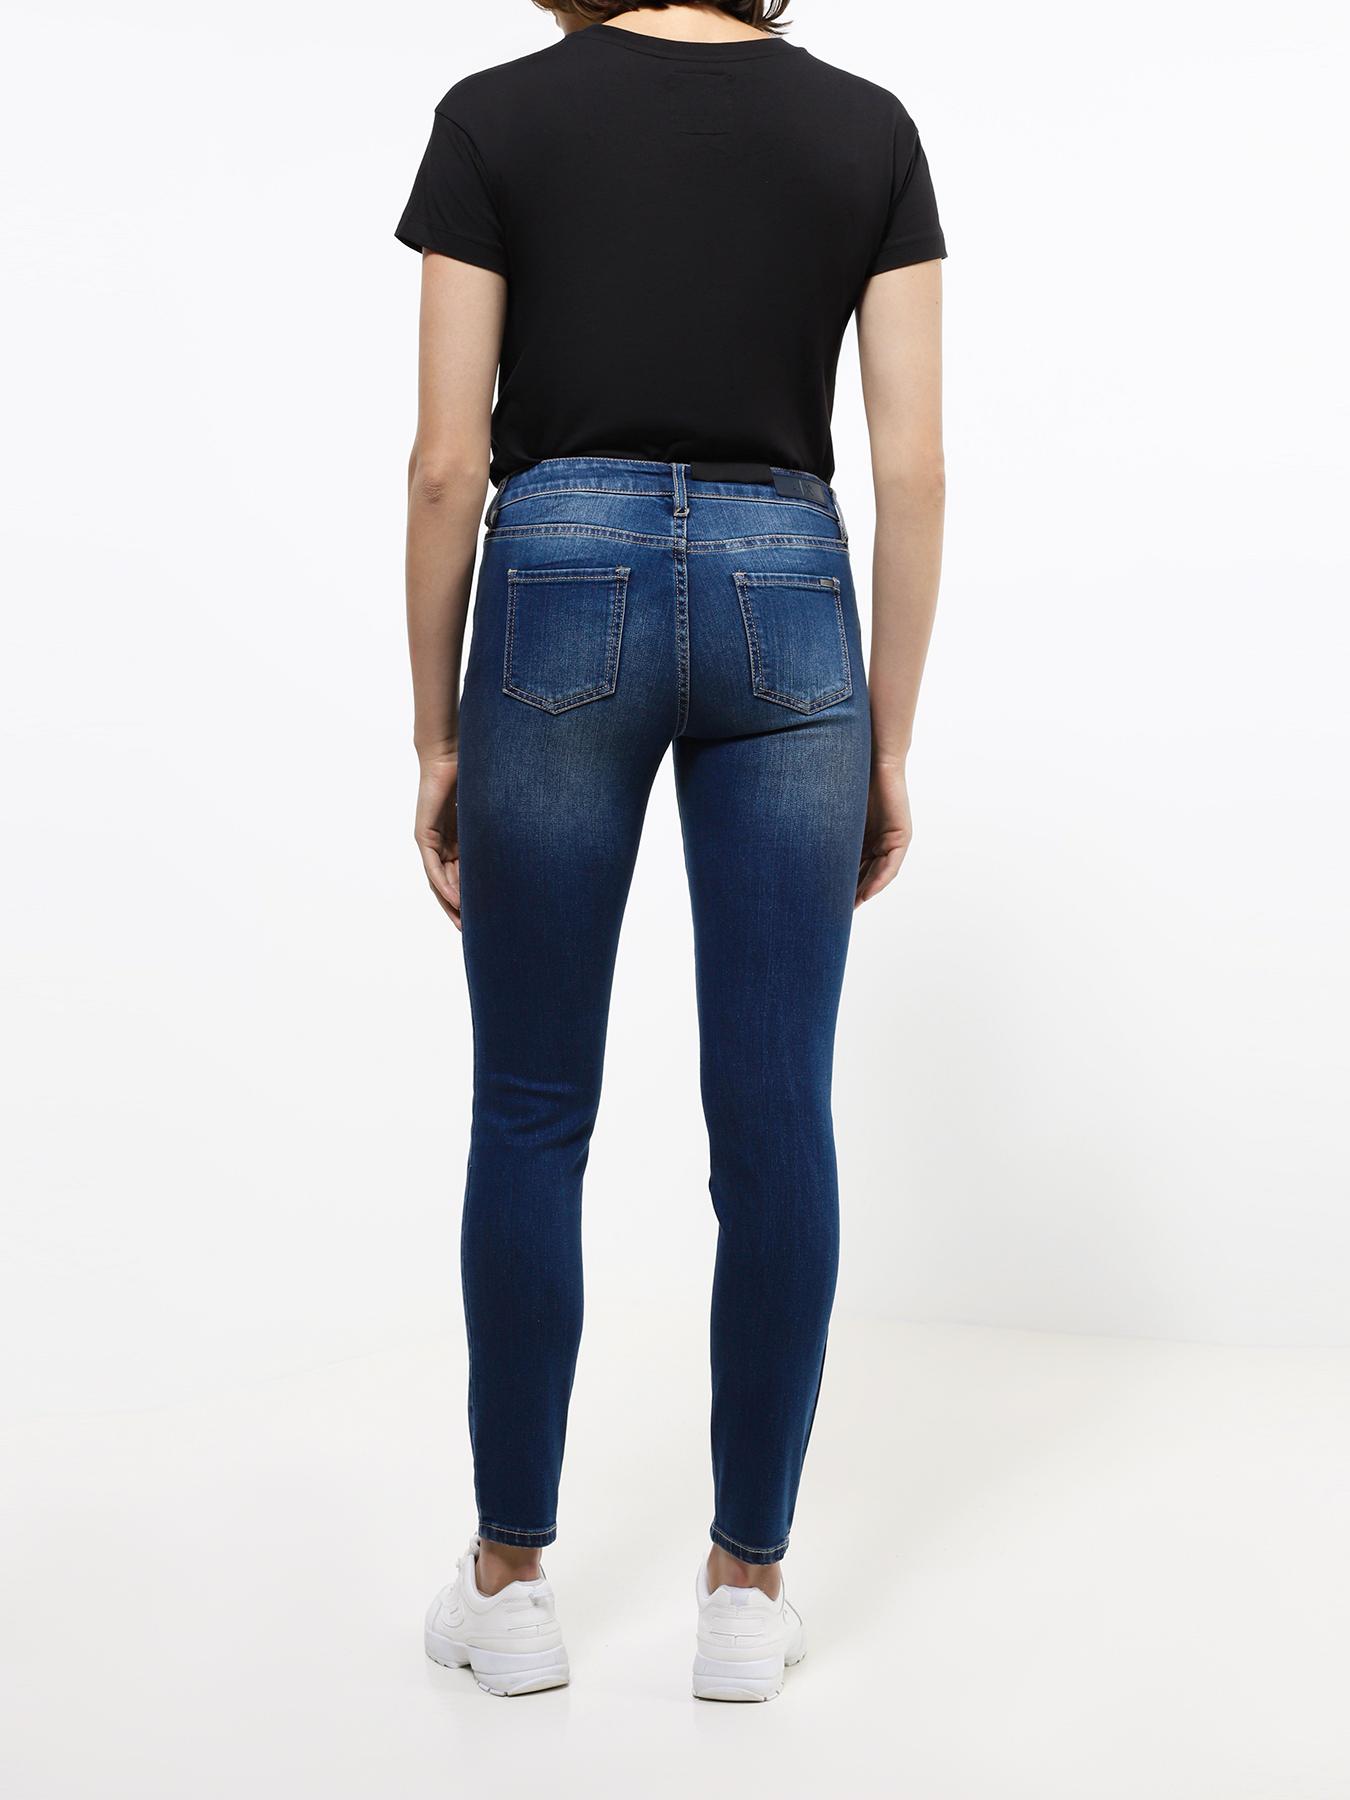 Armani Exchange Зауженные джинсы J01 фото